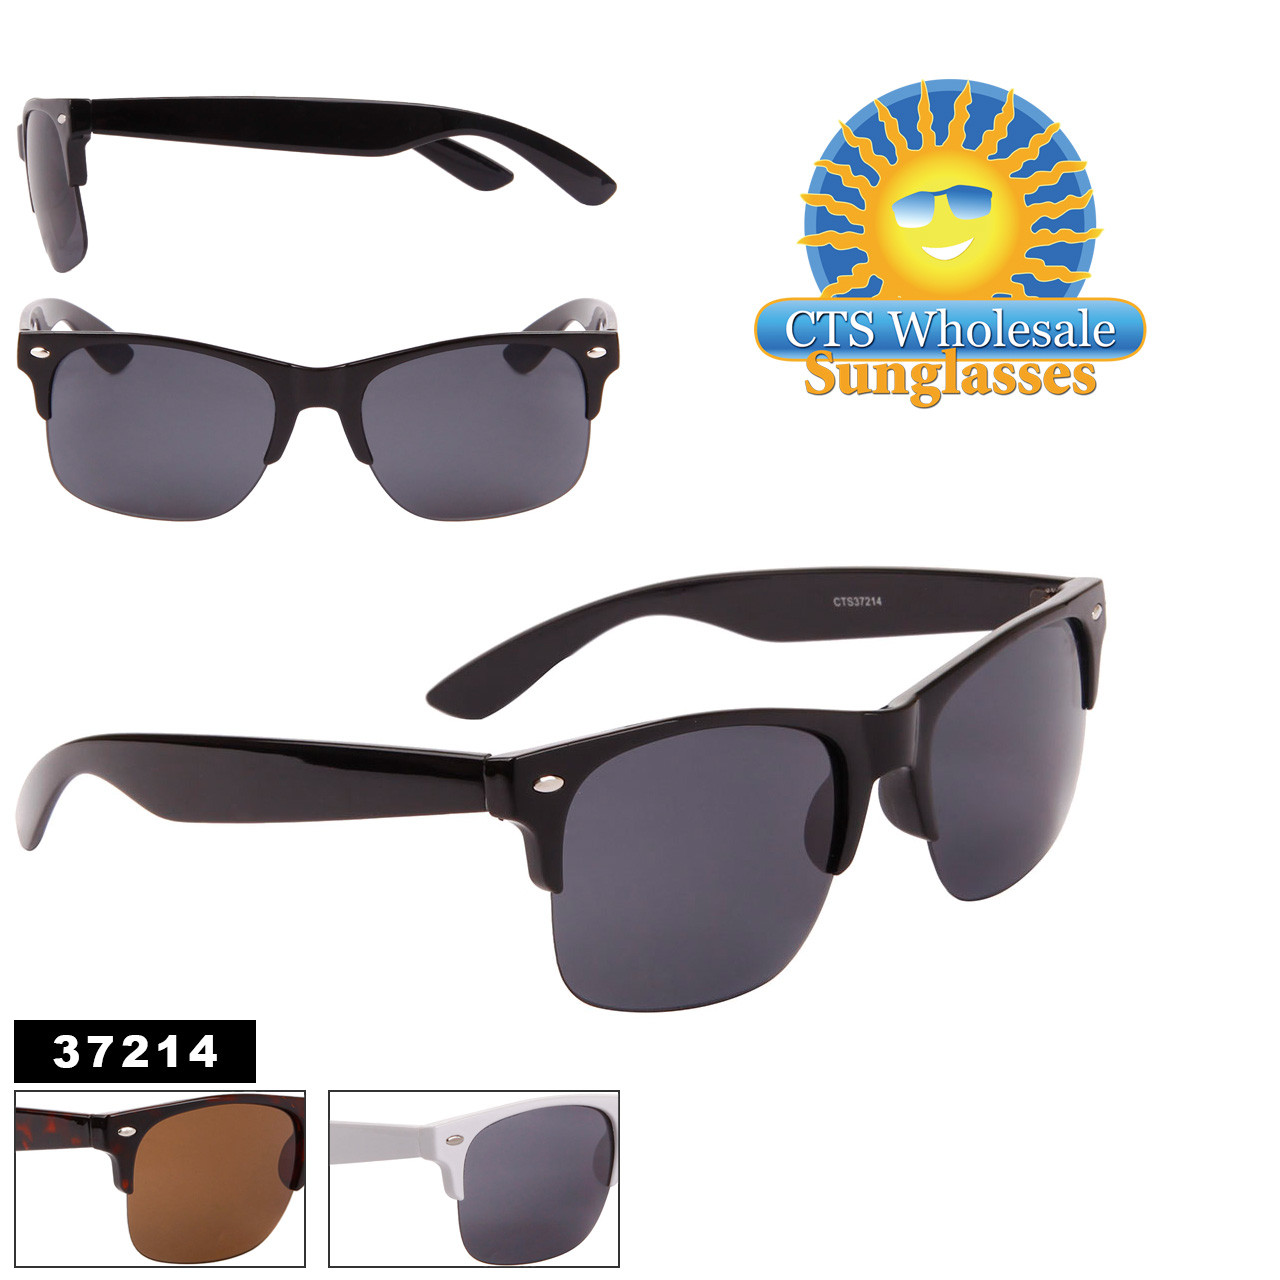 Unisex Sunglasses in Bulk - Style #37214 (Assorted Colors) (12 pcs.)